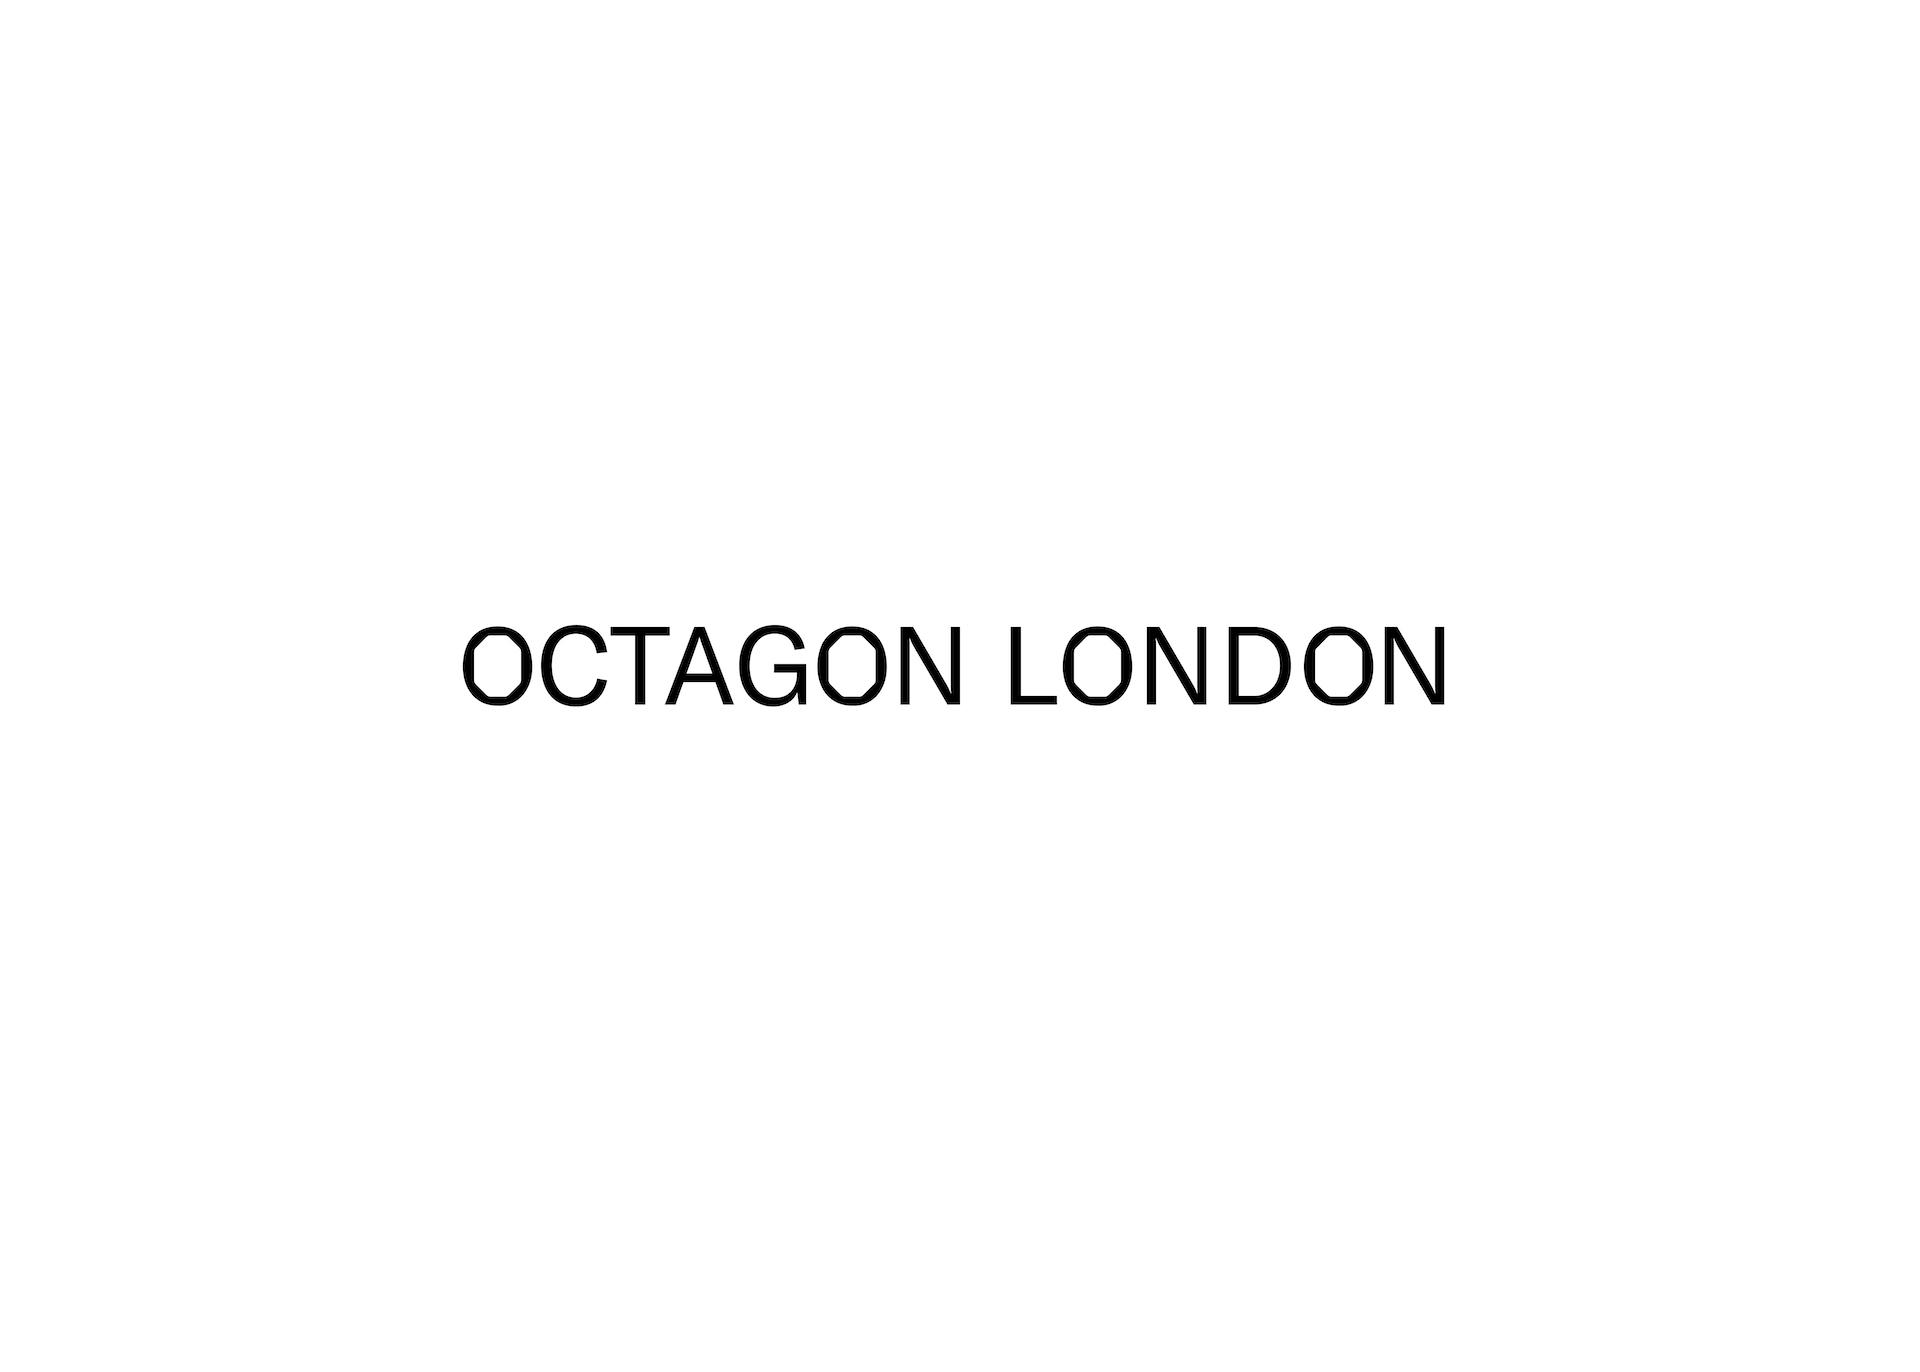 Octagon Brosure13.jpg